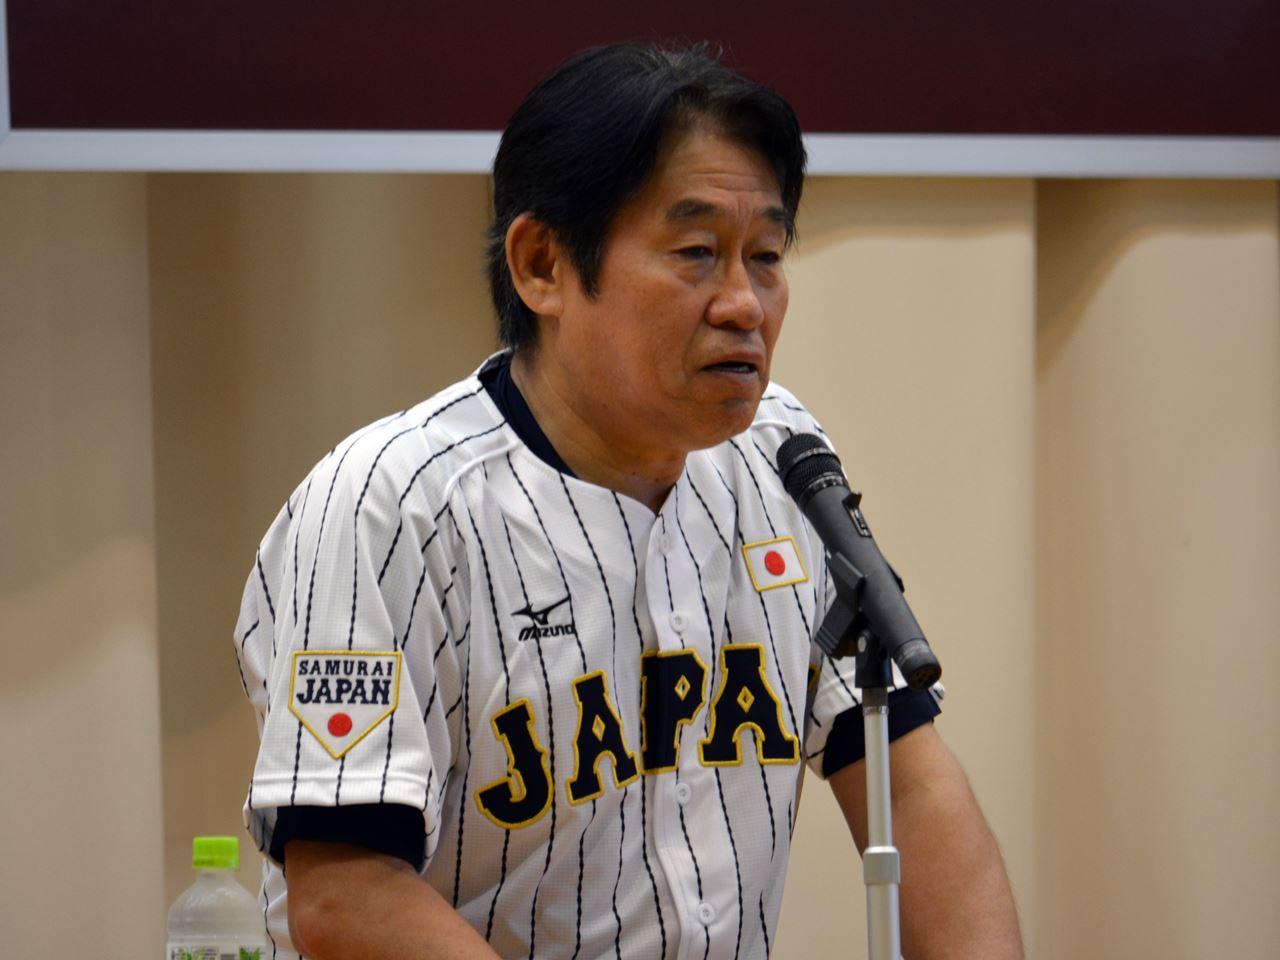 Japan announces National Team roster for WBSC U-15 Baseball World Cup 2016 Iwaki